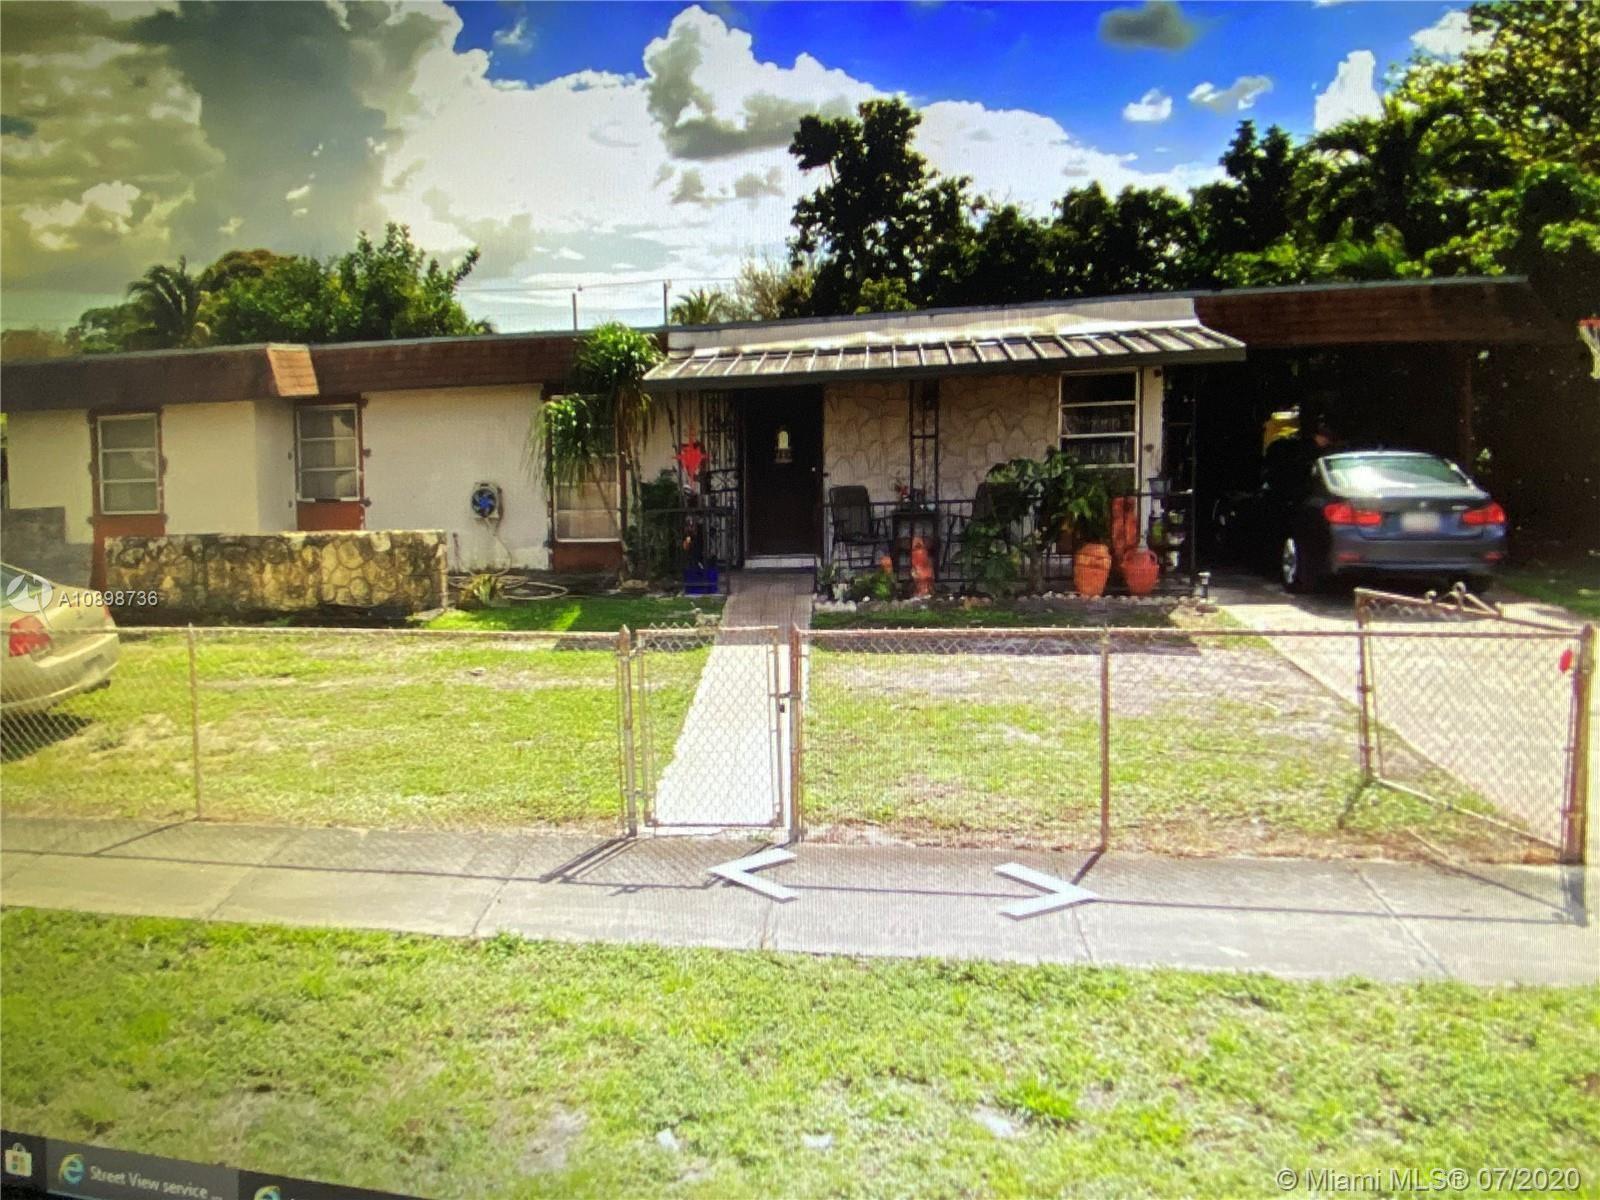 4920 NW 192nd St, Miami Gardens, FL 33055 - #: A10898736